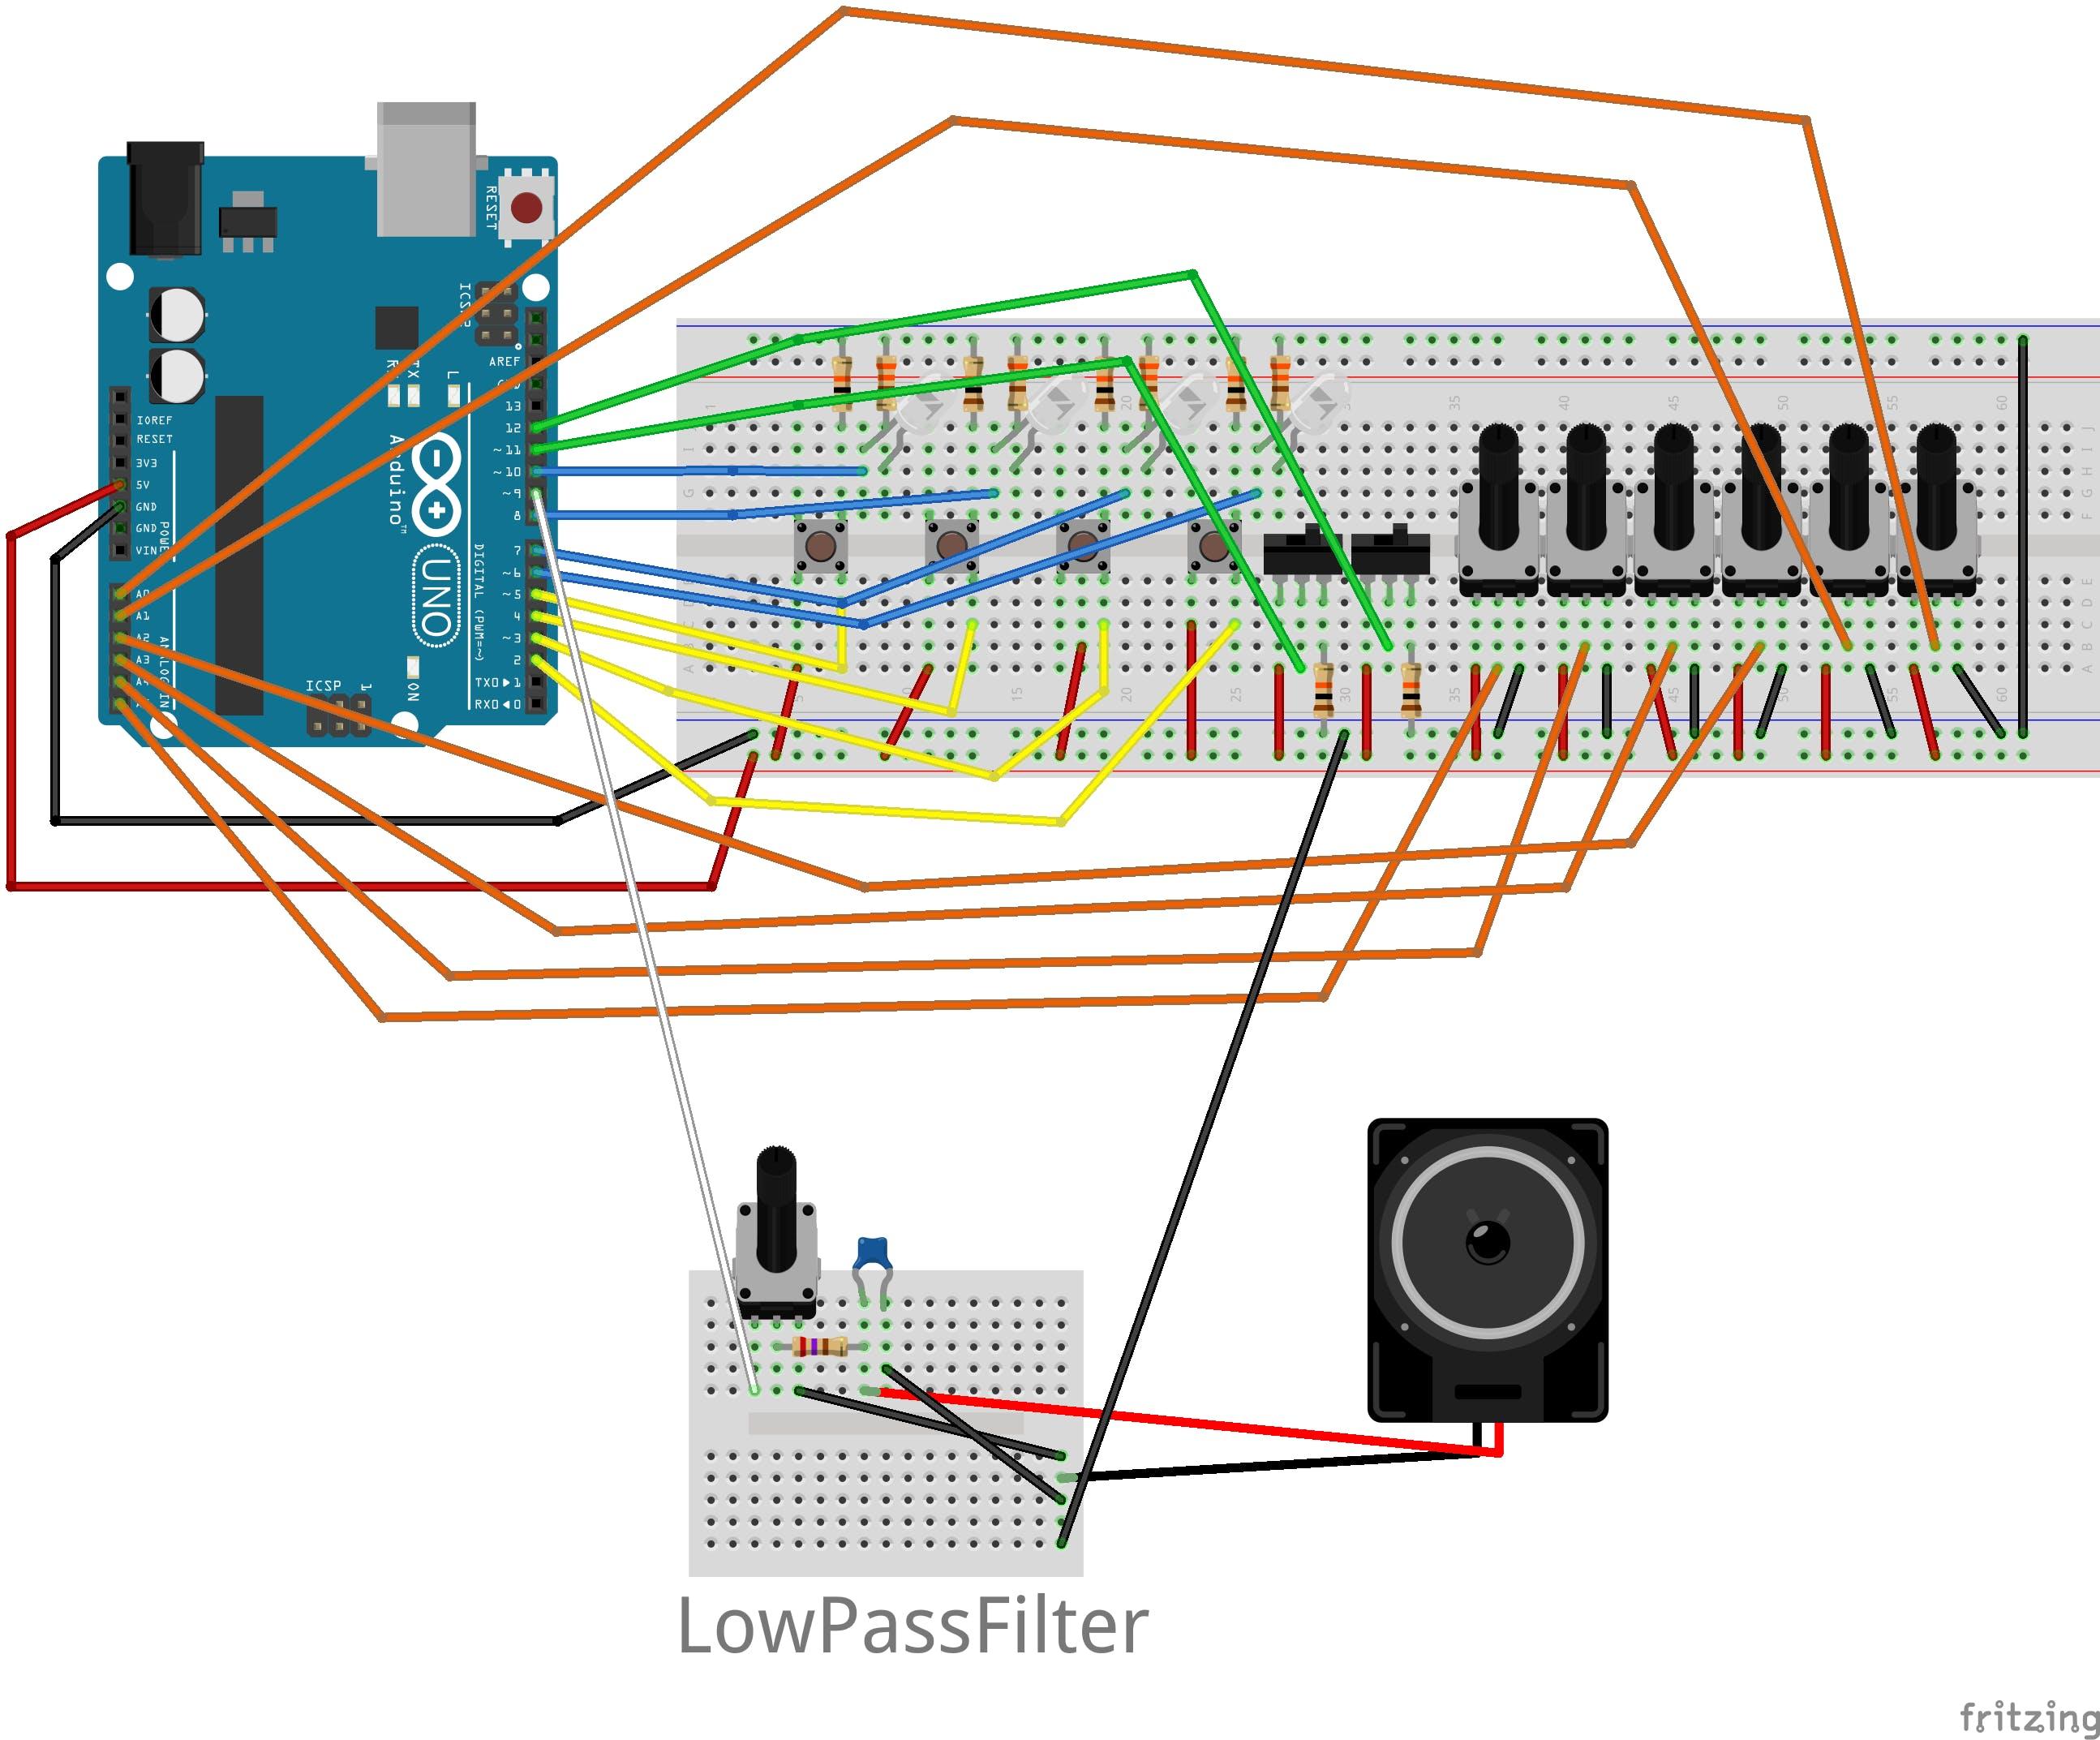 arduino+mozziでステップシーケンサーっぽいシンセサイザー製作 - Qiita